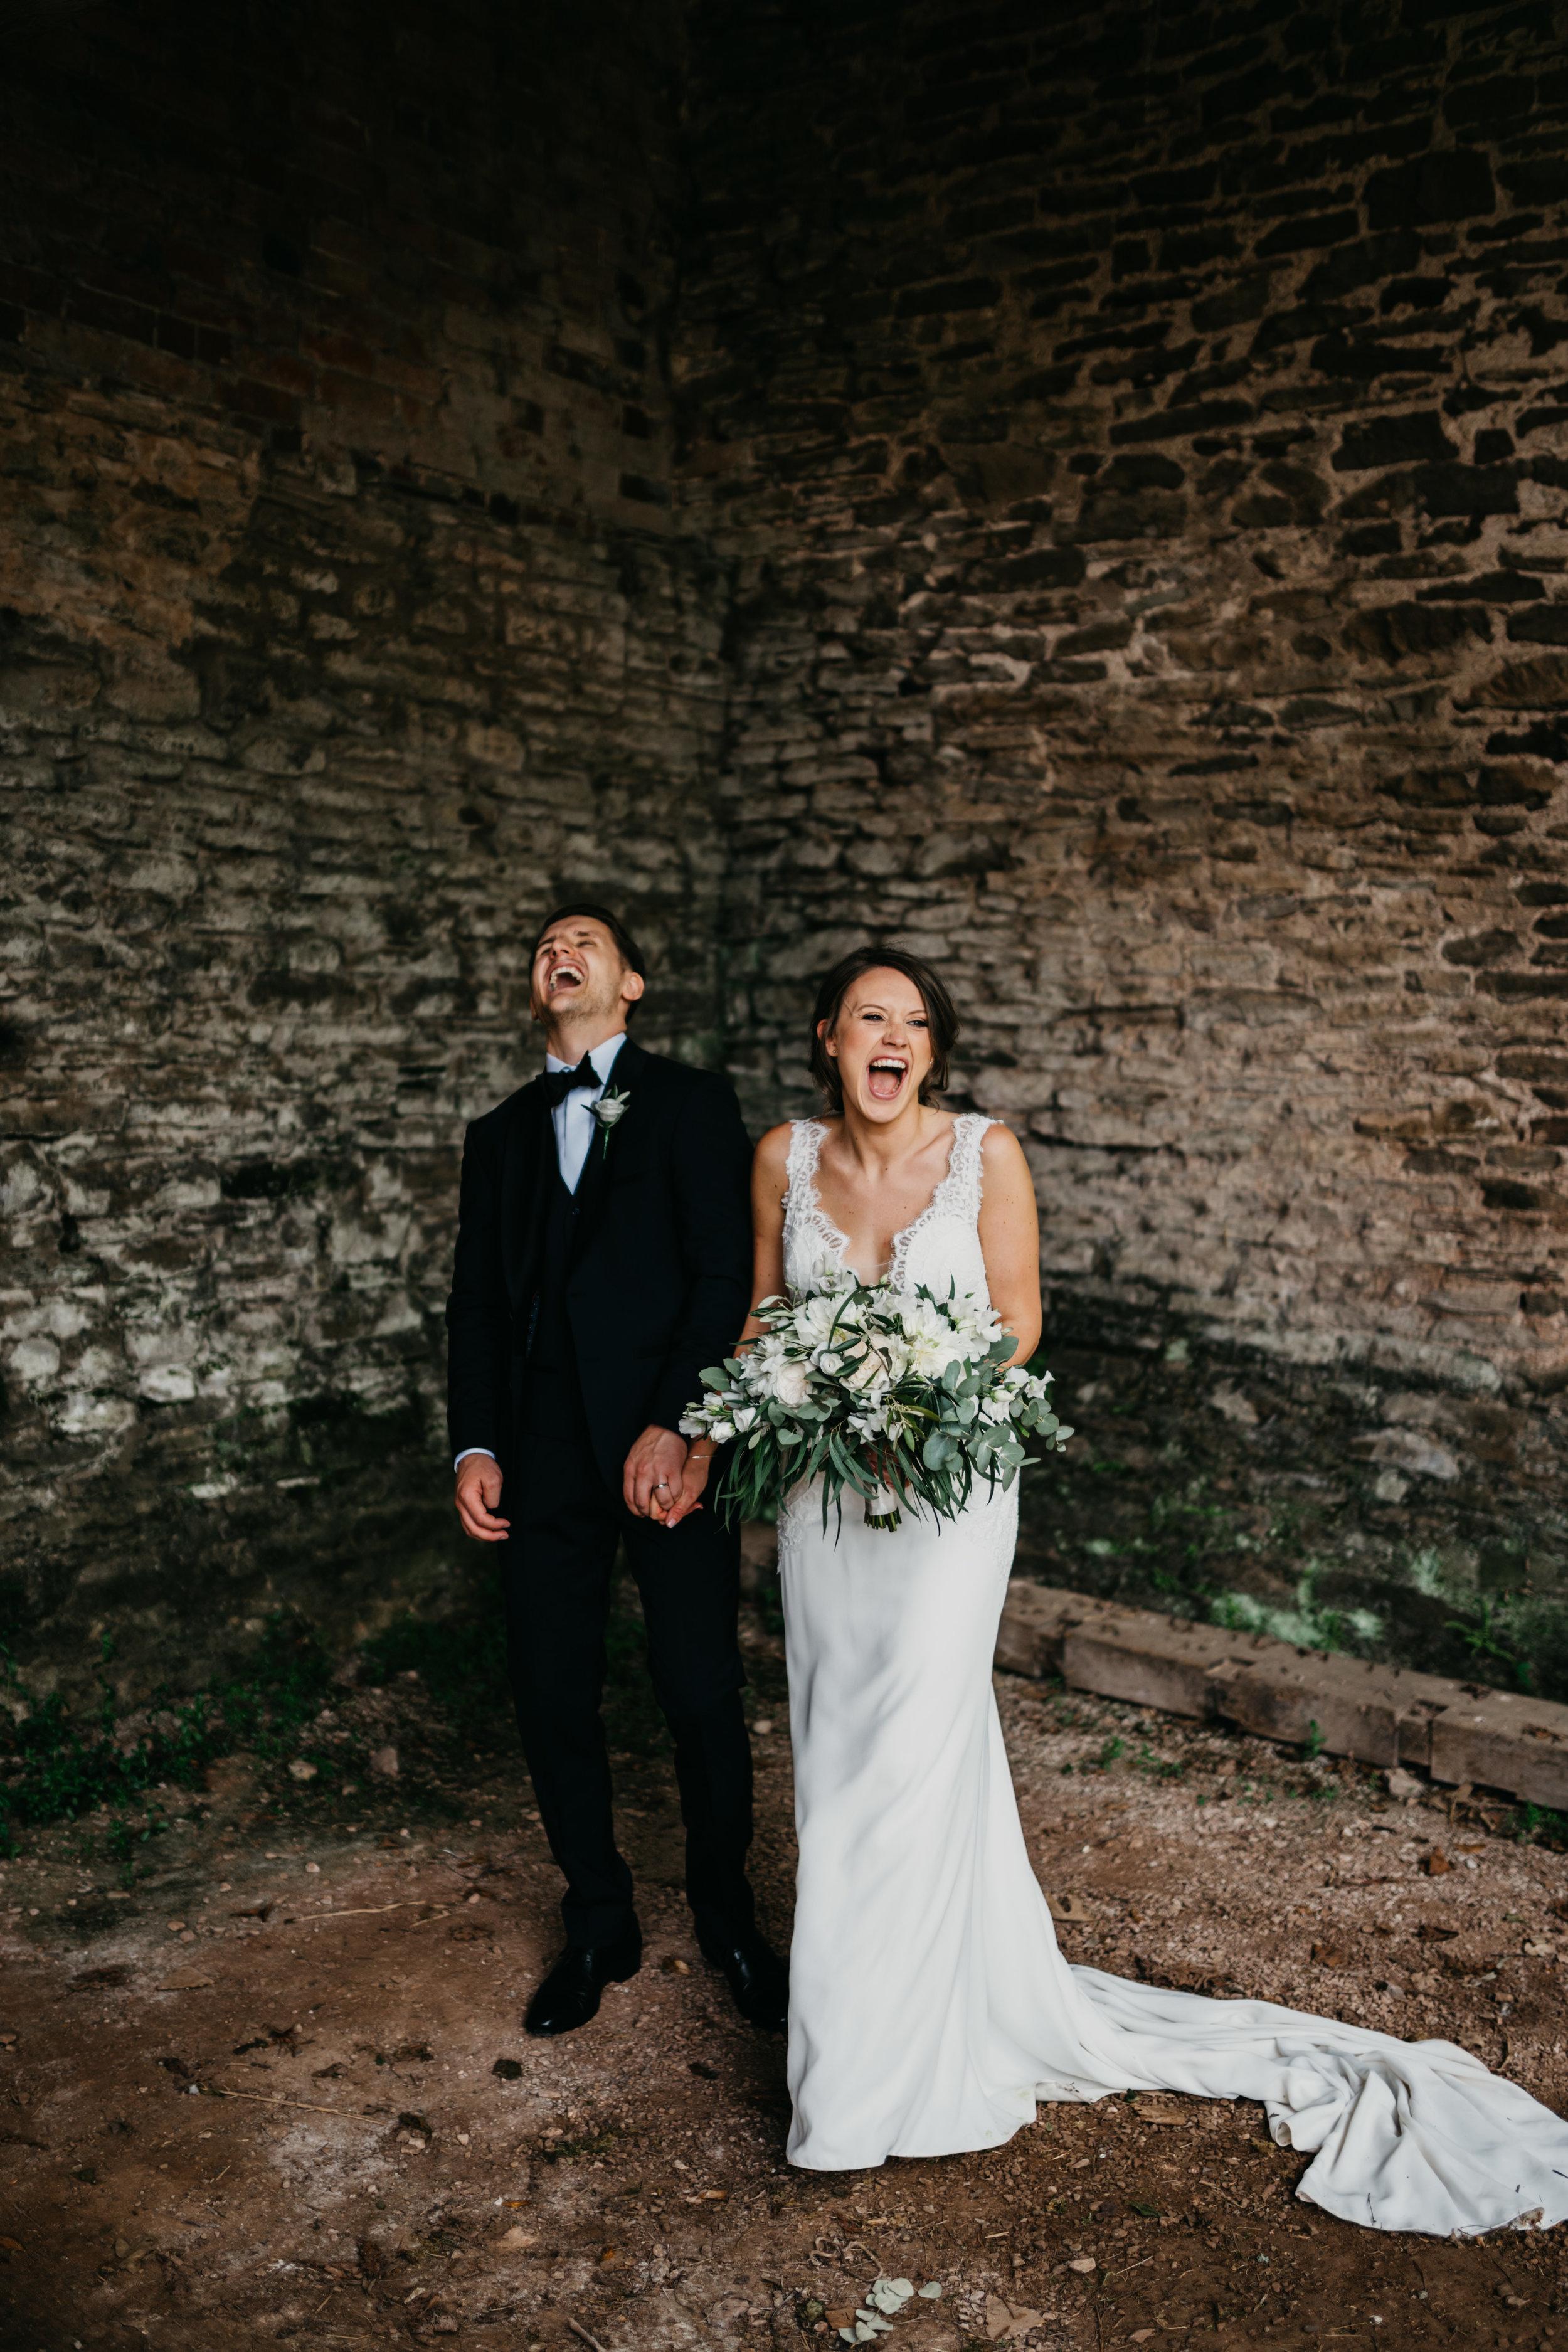 Dewsall Court wedding photography - Josie and Matt